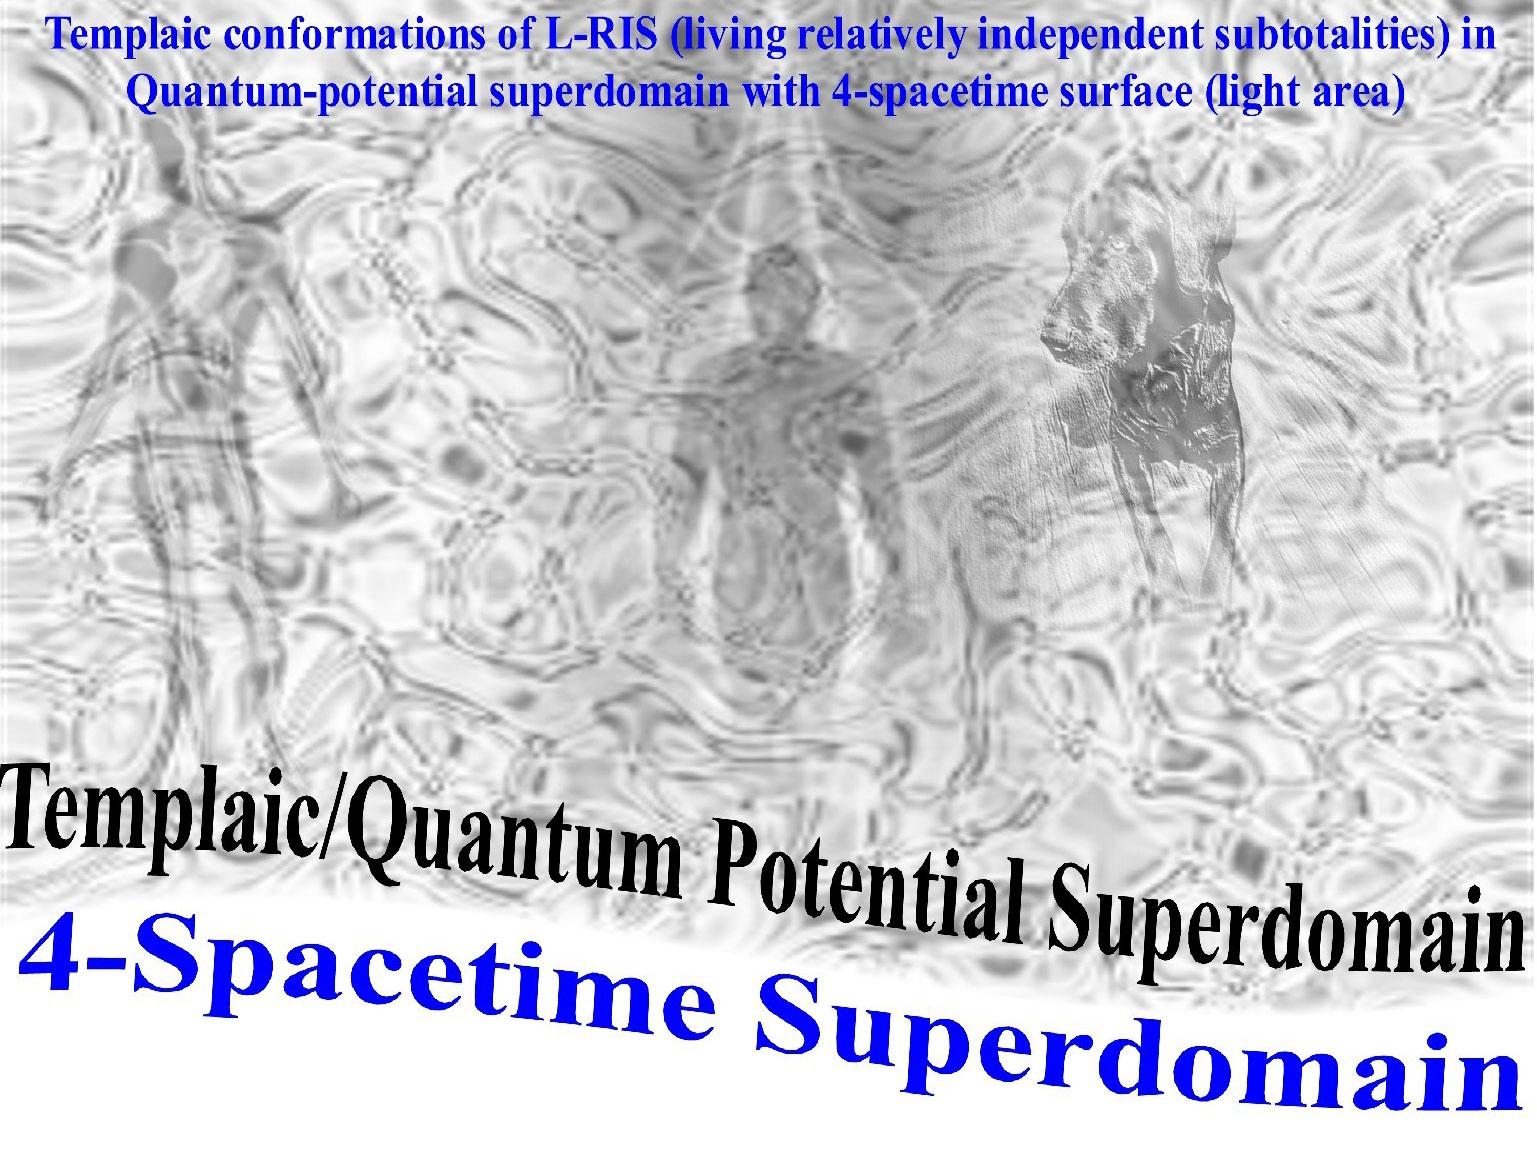 HumanCOBETemplaicQuantum020.jpg